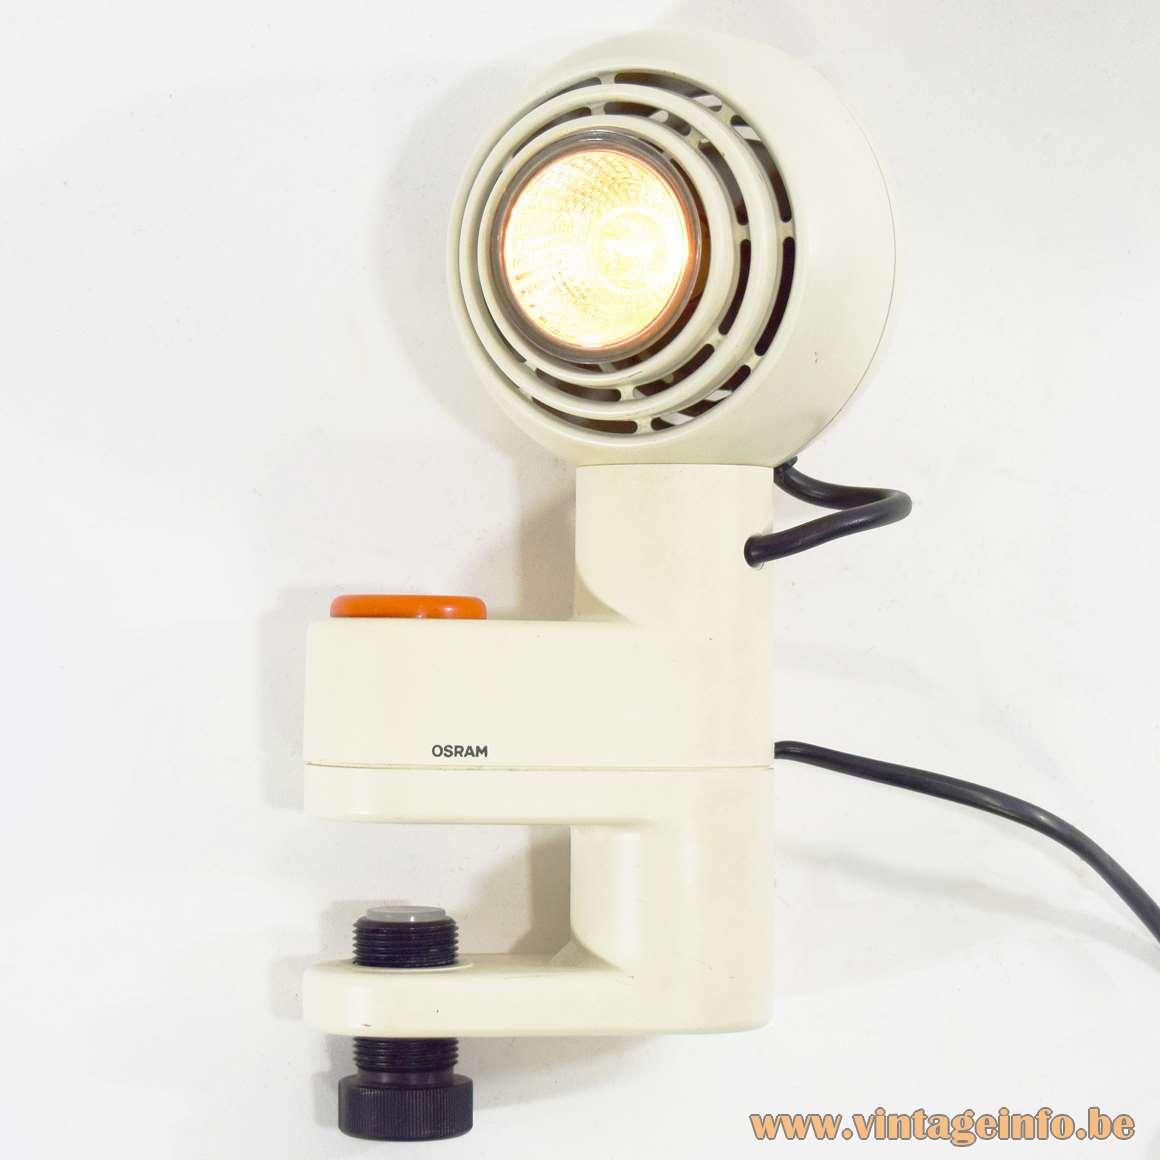 Osram Concentra Agilo Clamp Lamp